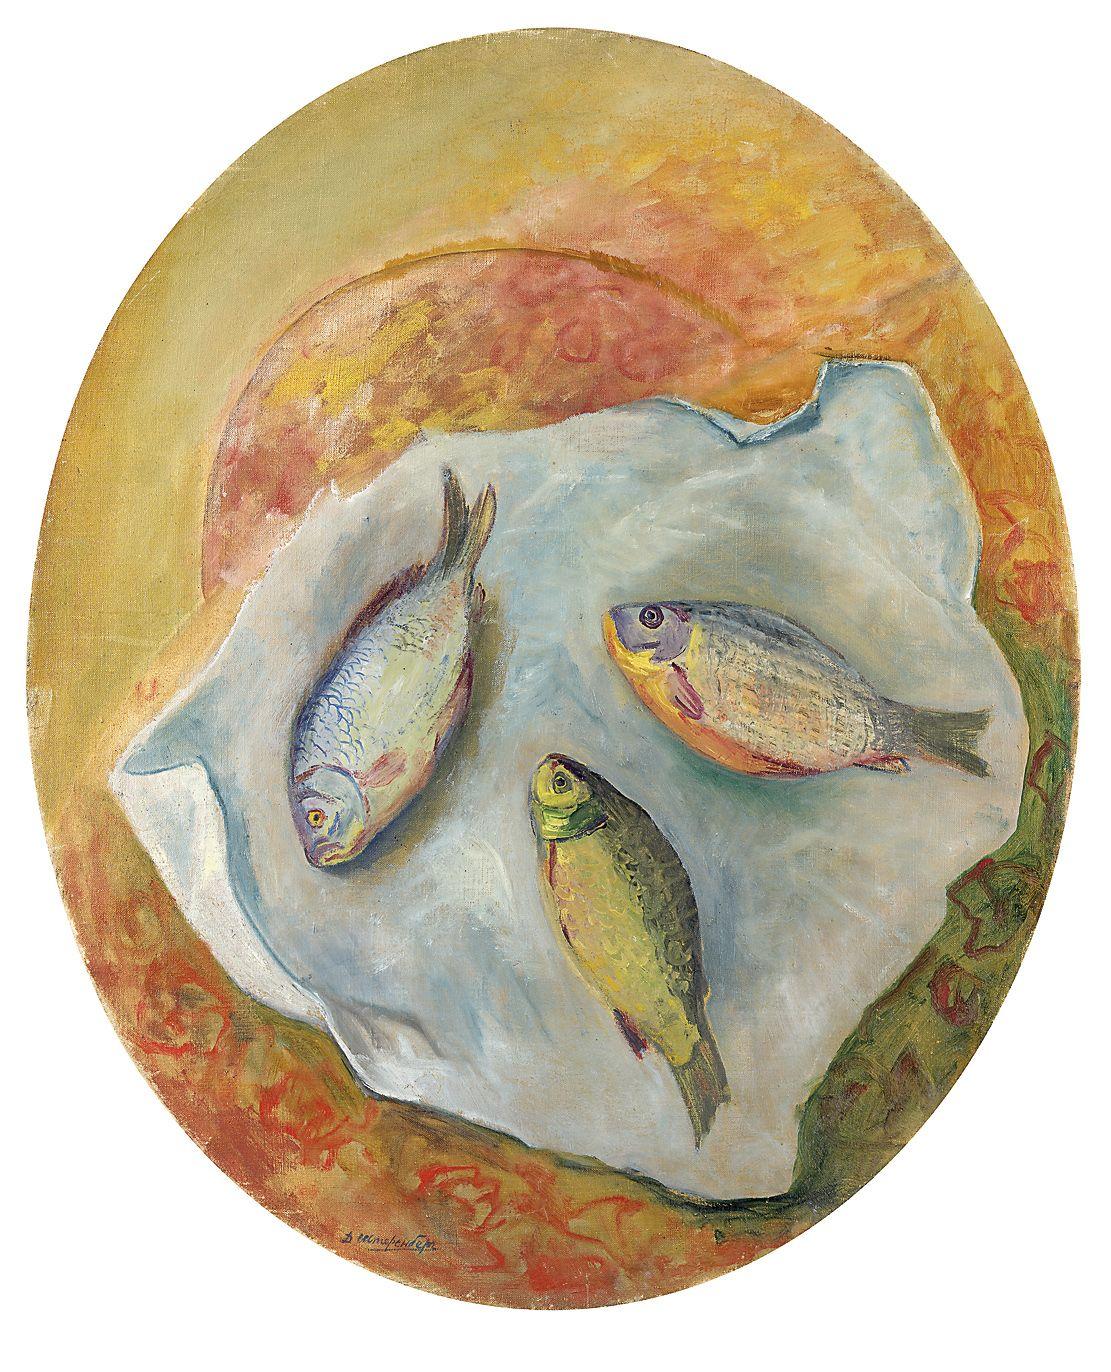 Lot 24 David Shterenberg, Still Life with Fish